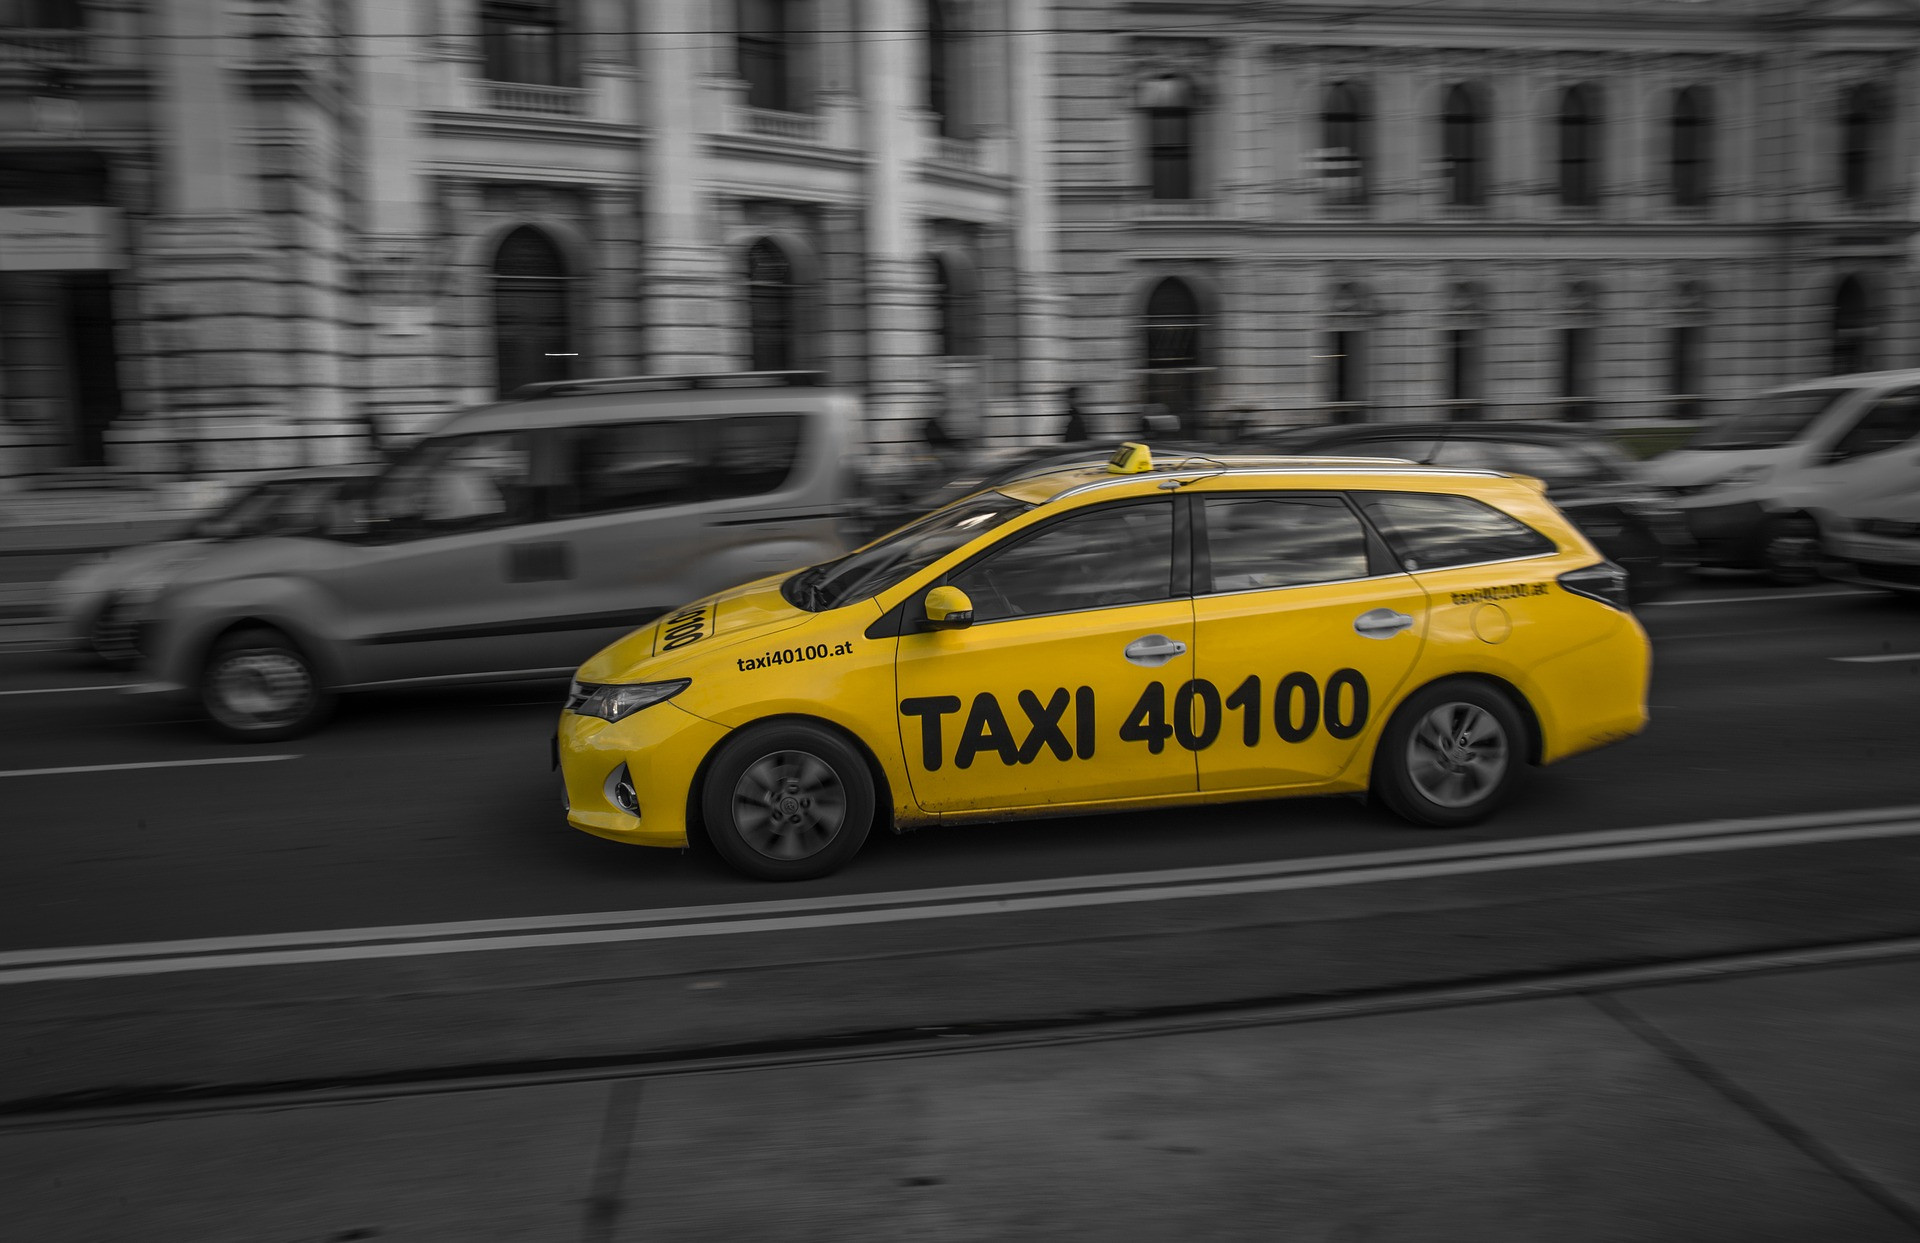 Taxi_RudyPeterSkitteriansPixabay.jpg